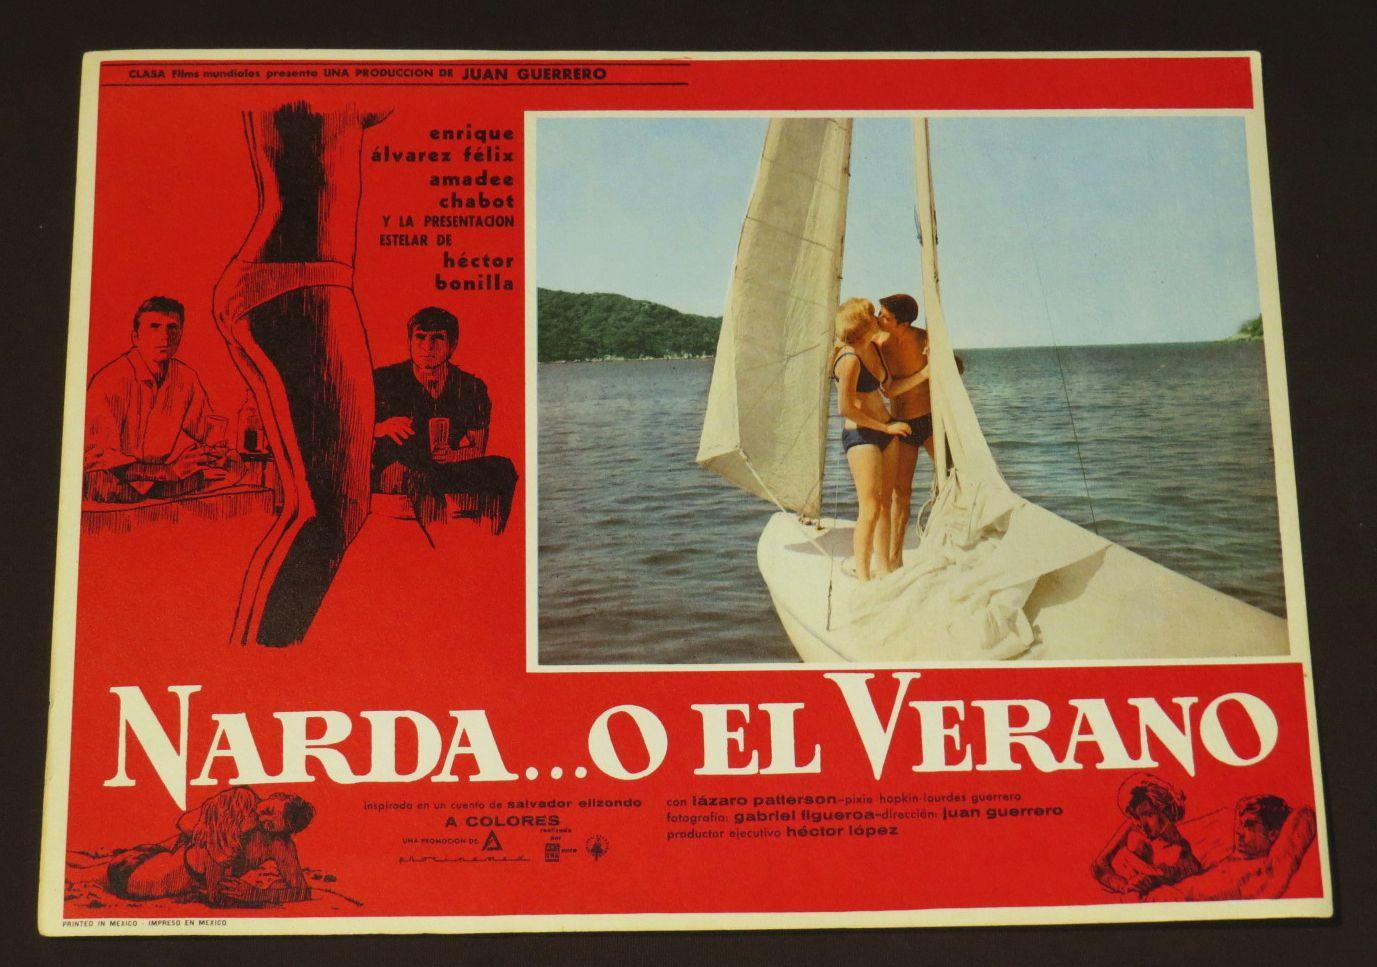 Amadee Chabot cartel de cine: narda. o el verano